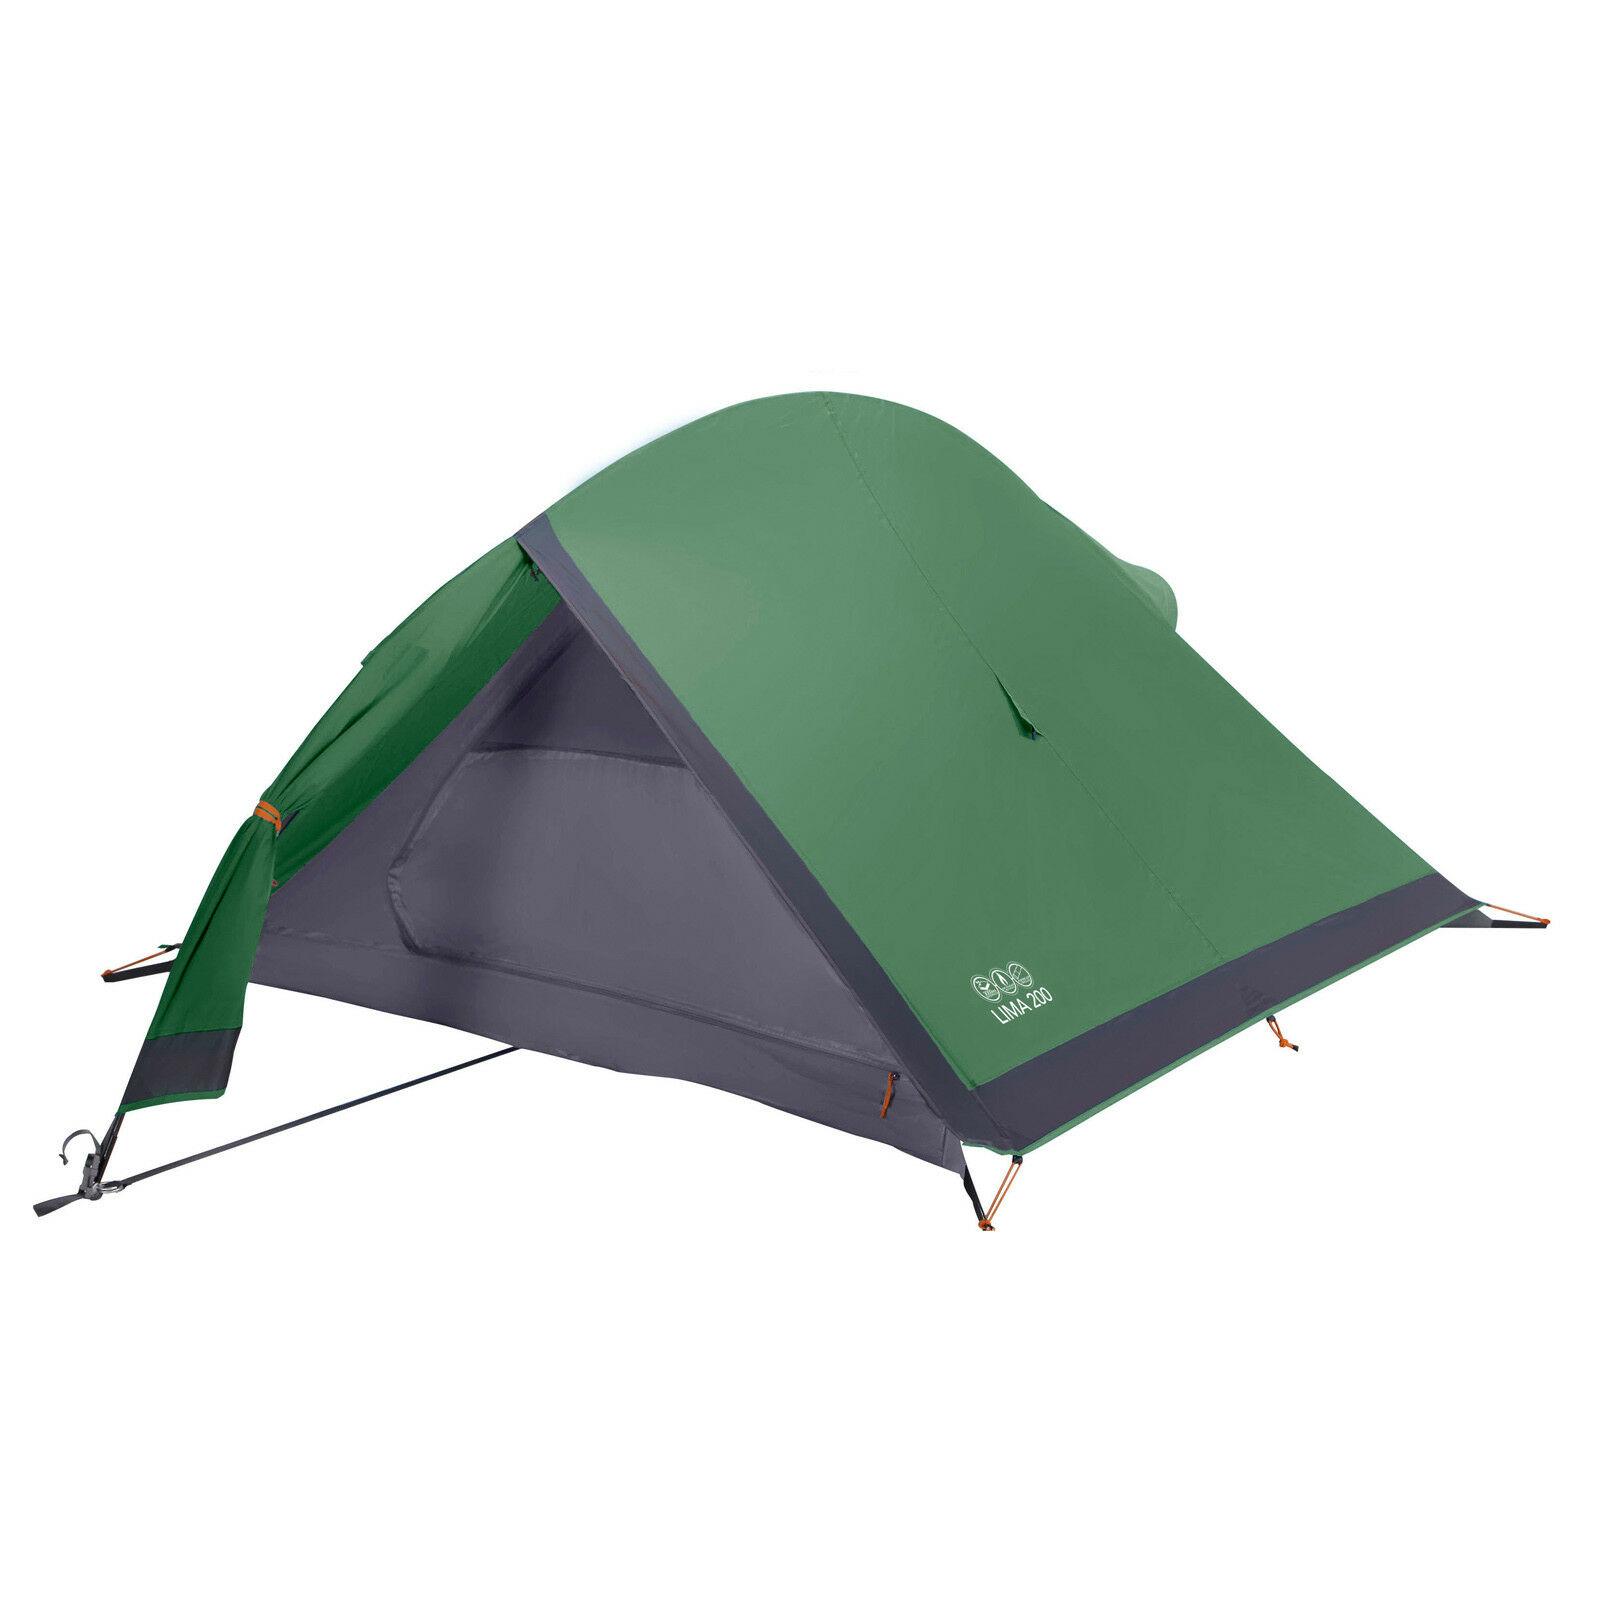 2 Mann Zelt VANGO Lima 200 Trekkingzelt für 2 Personen Fahrradzelt Camping Zelt